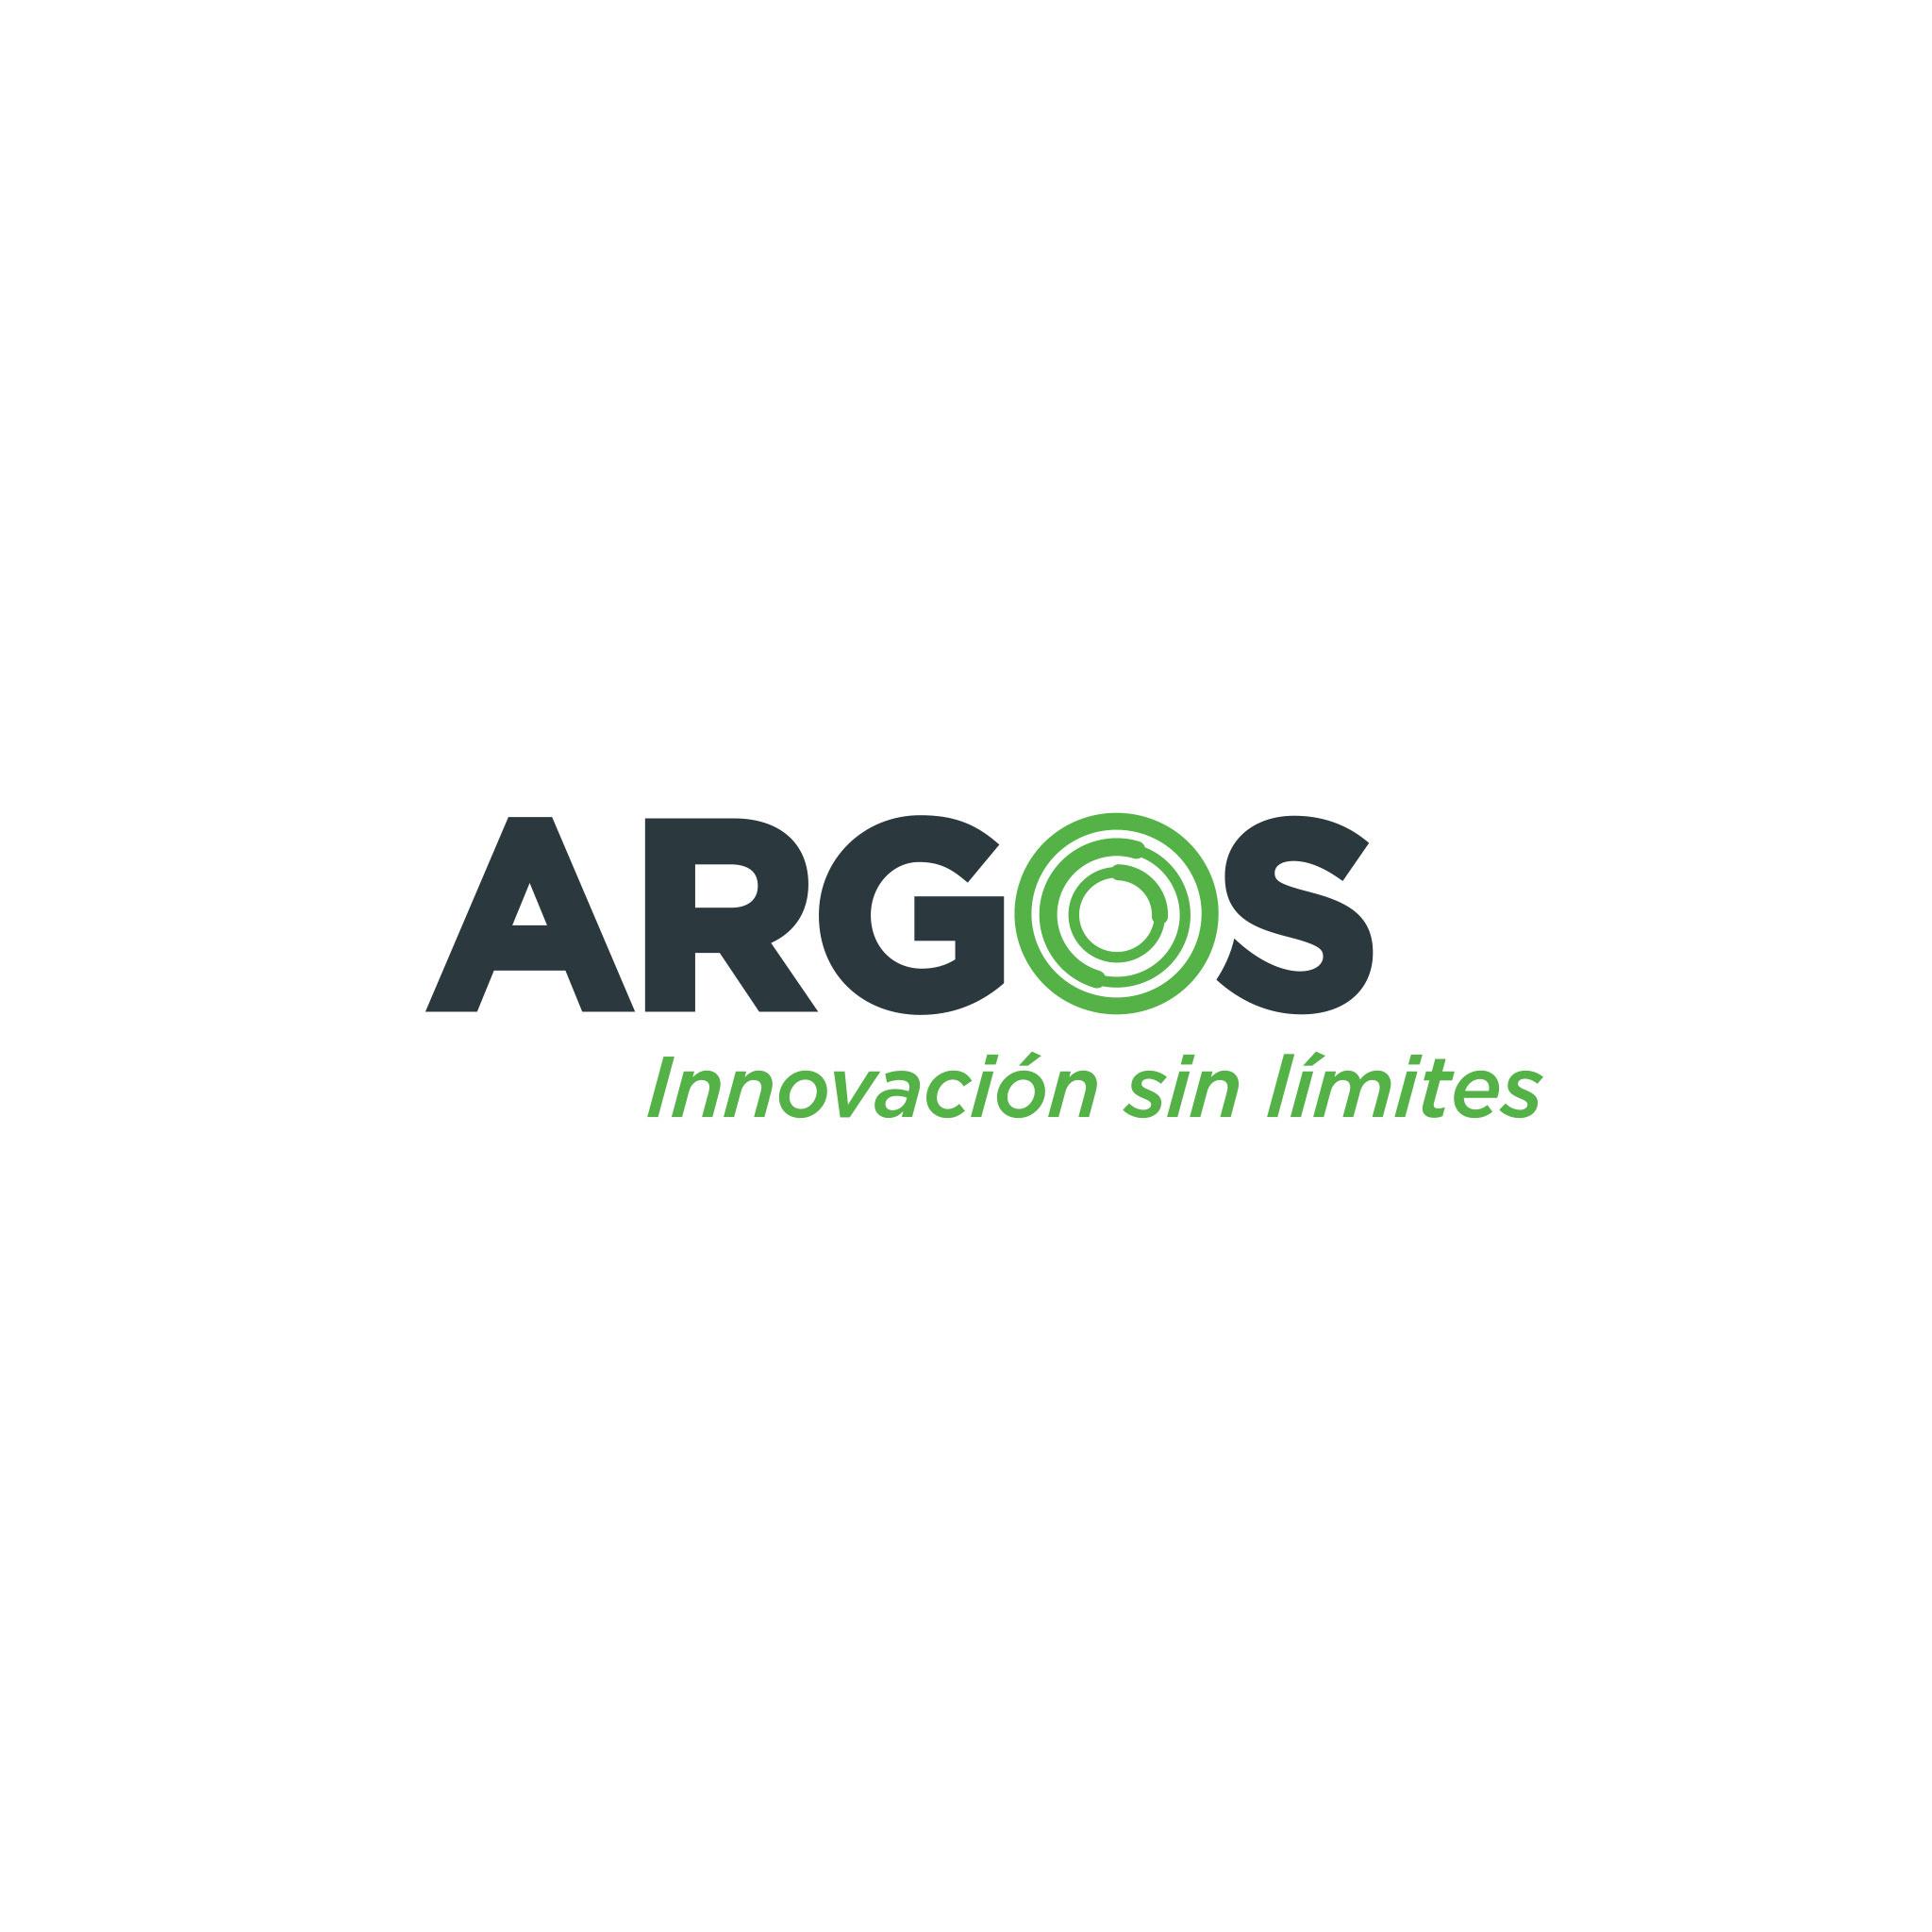 fij_argos